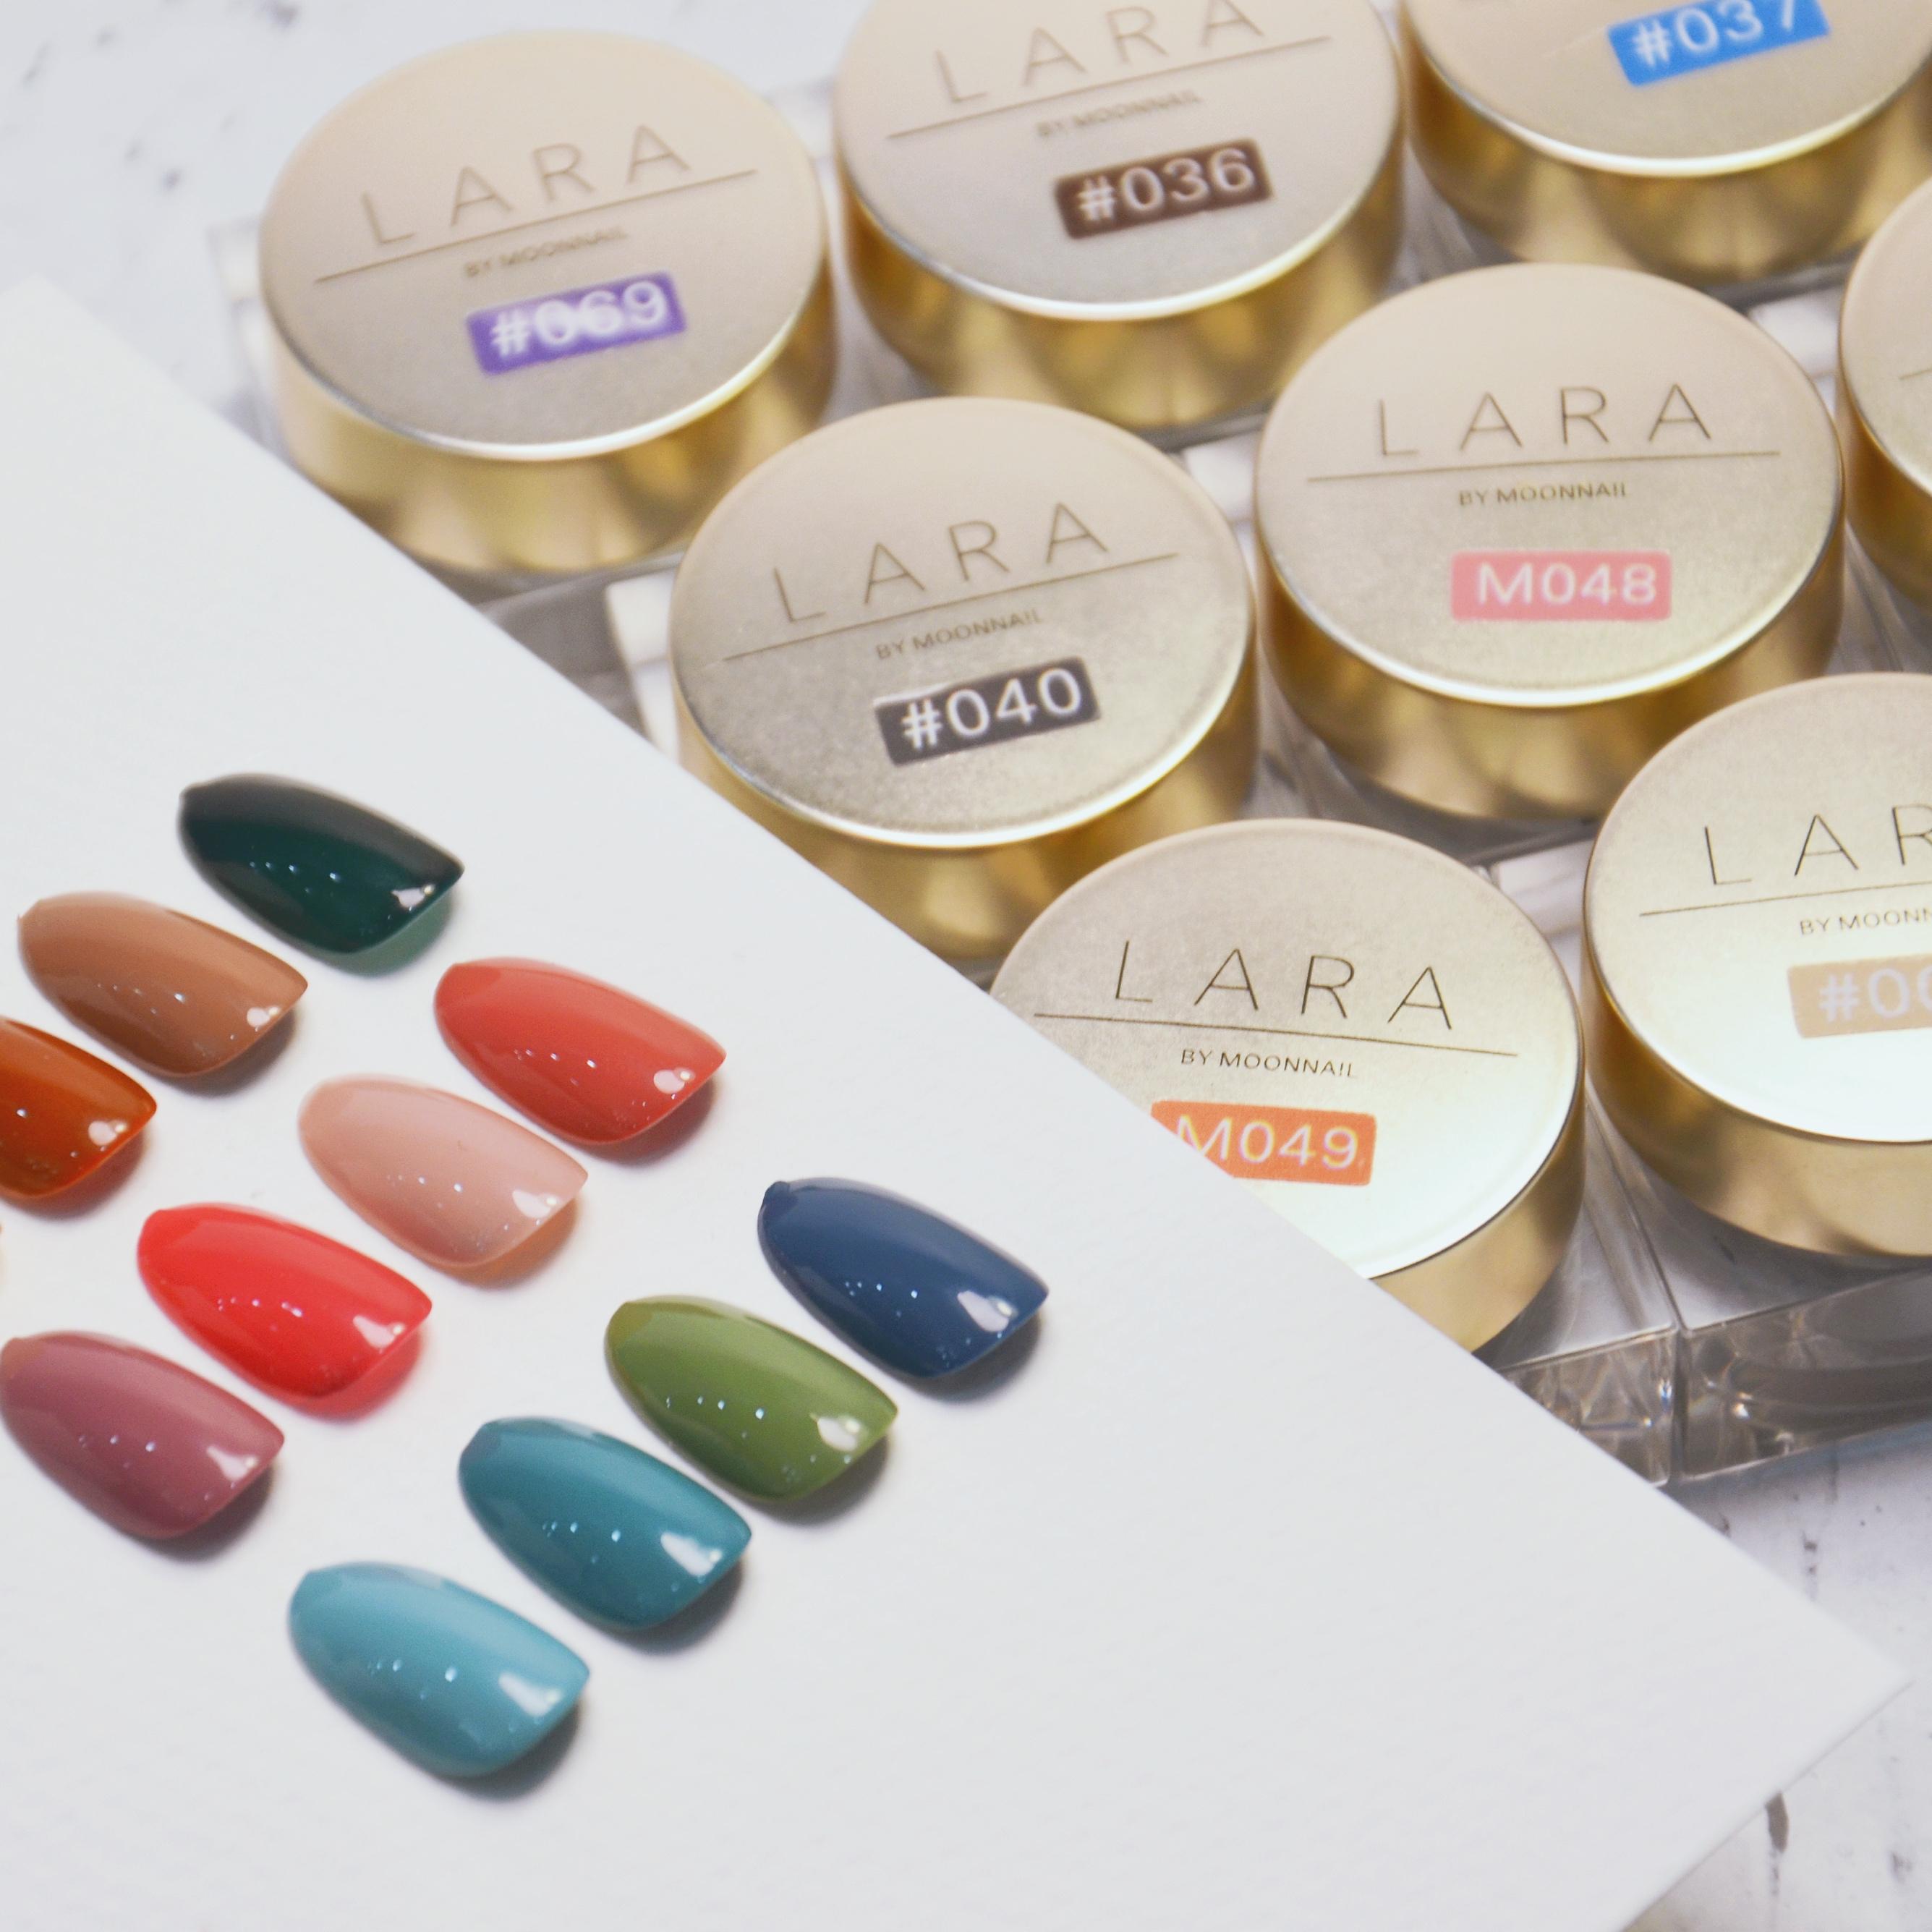 LARA日本罐装78色大套装指甲油胶晕染液沙龙美甲店专用光疗胶新款